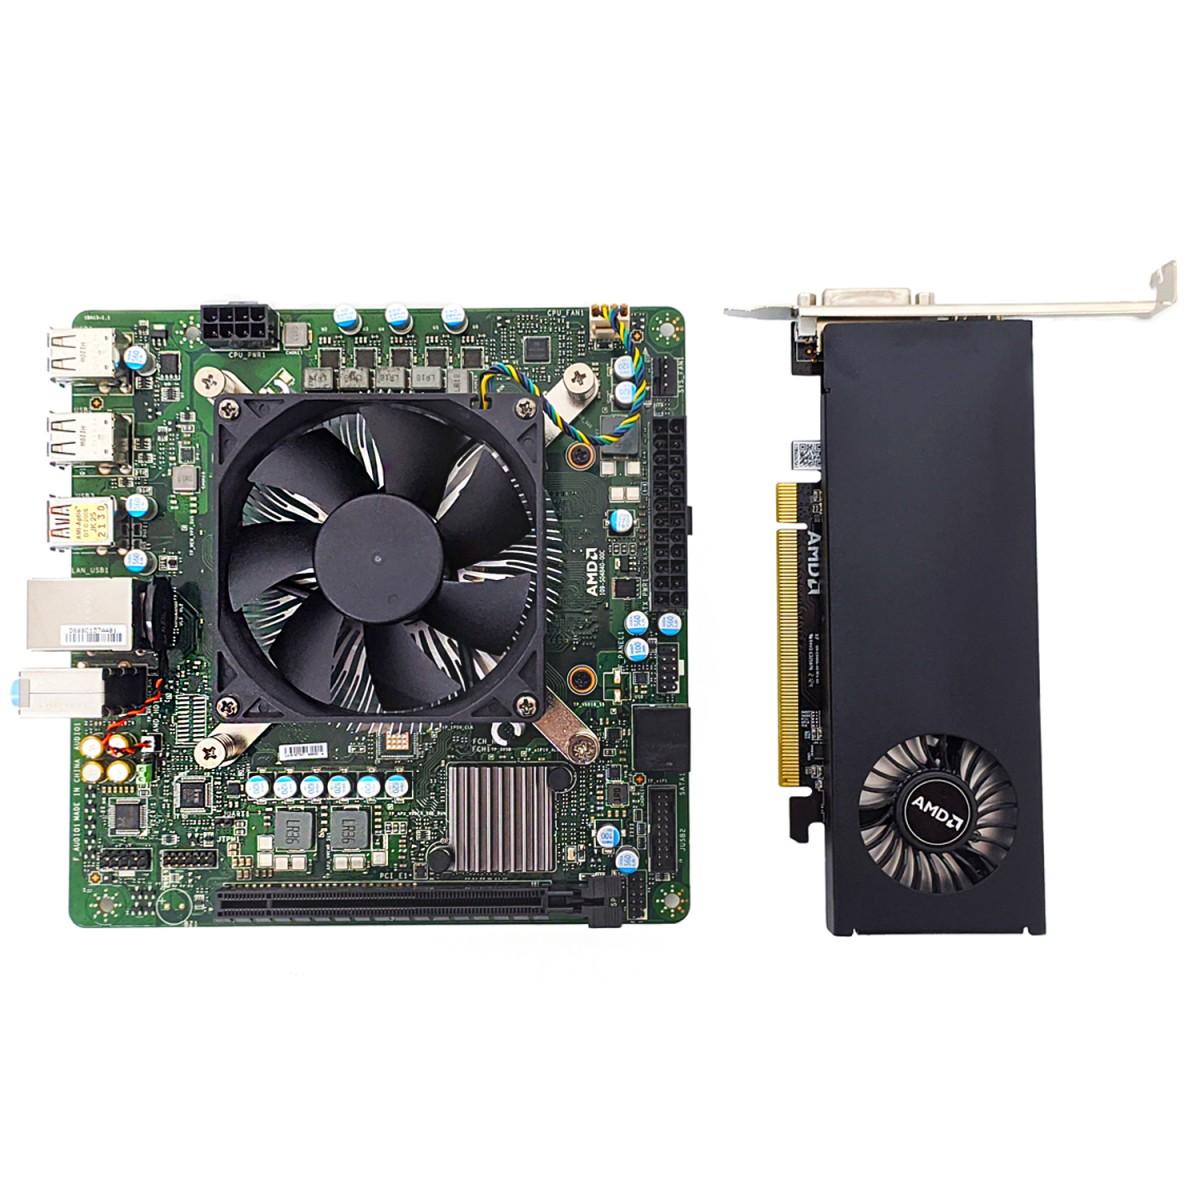 Kit Upgrade AMD Cardinal Zen 2, Processador AMD 4700S 3.6Ghz (Turbo 4.0Ghz), Placa de vídeo RX 550 2GB, Memória RAM 16GB